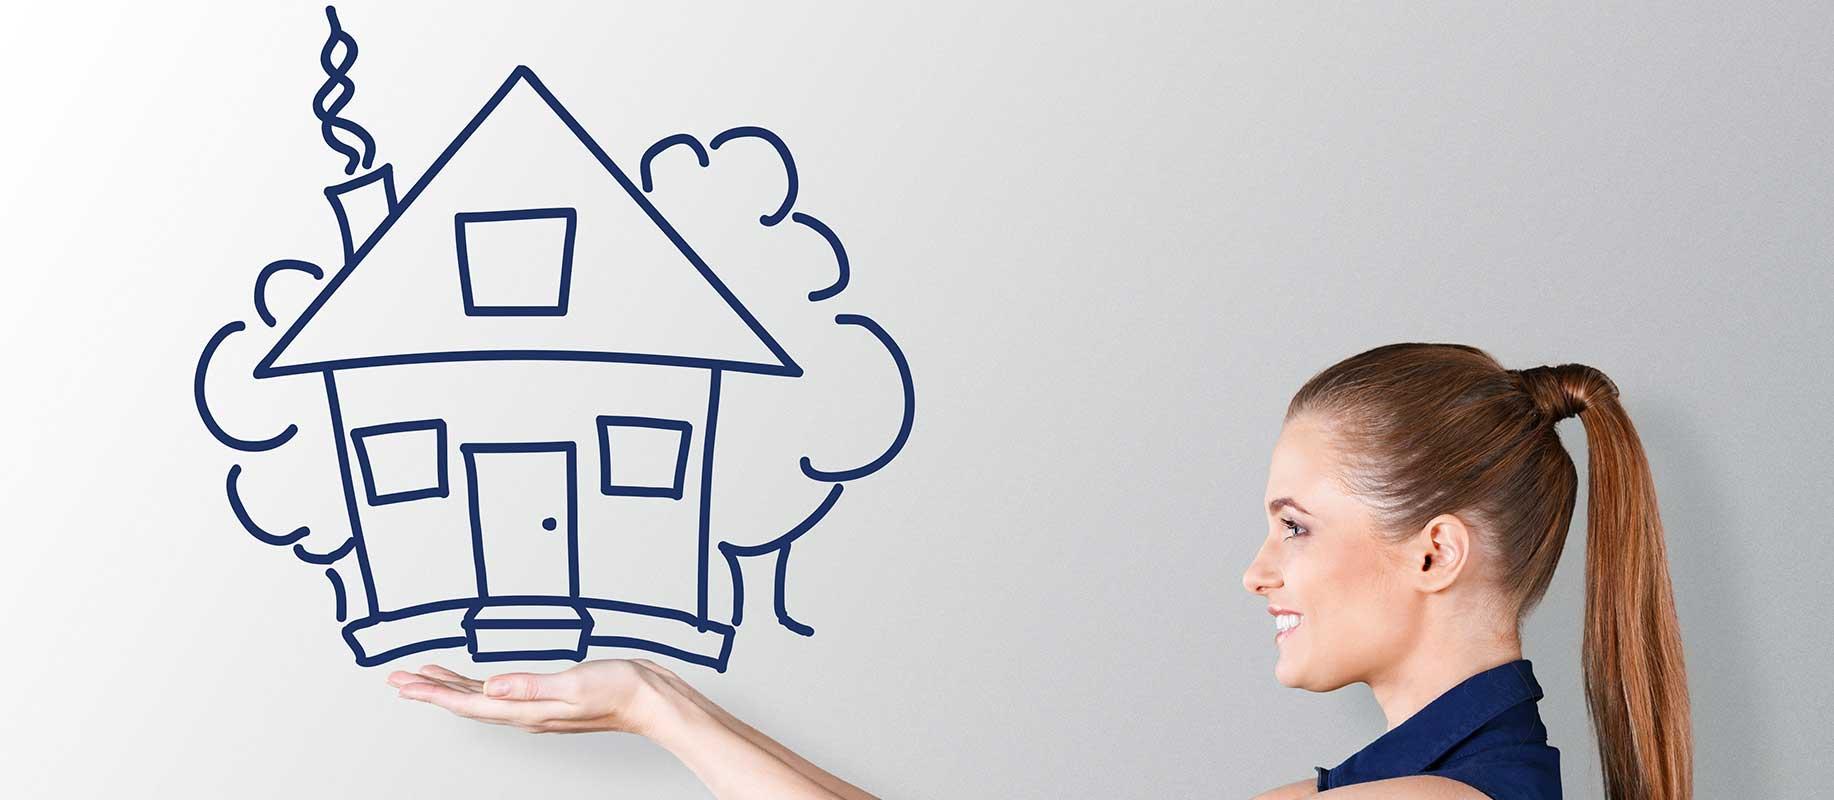 achat immobilier le pr t taux z ro ptz cic. Black Bedroom Furniture Sets. Home Design Ideas